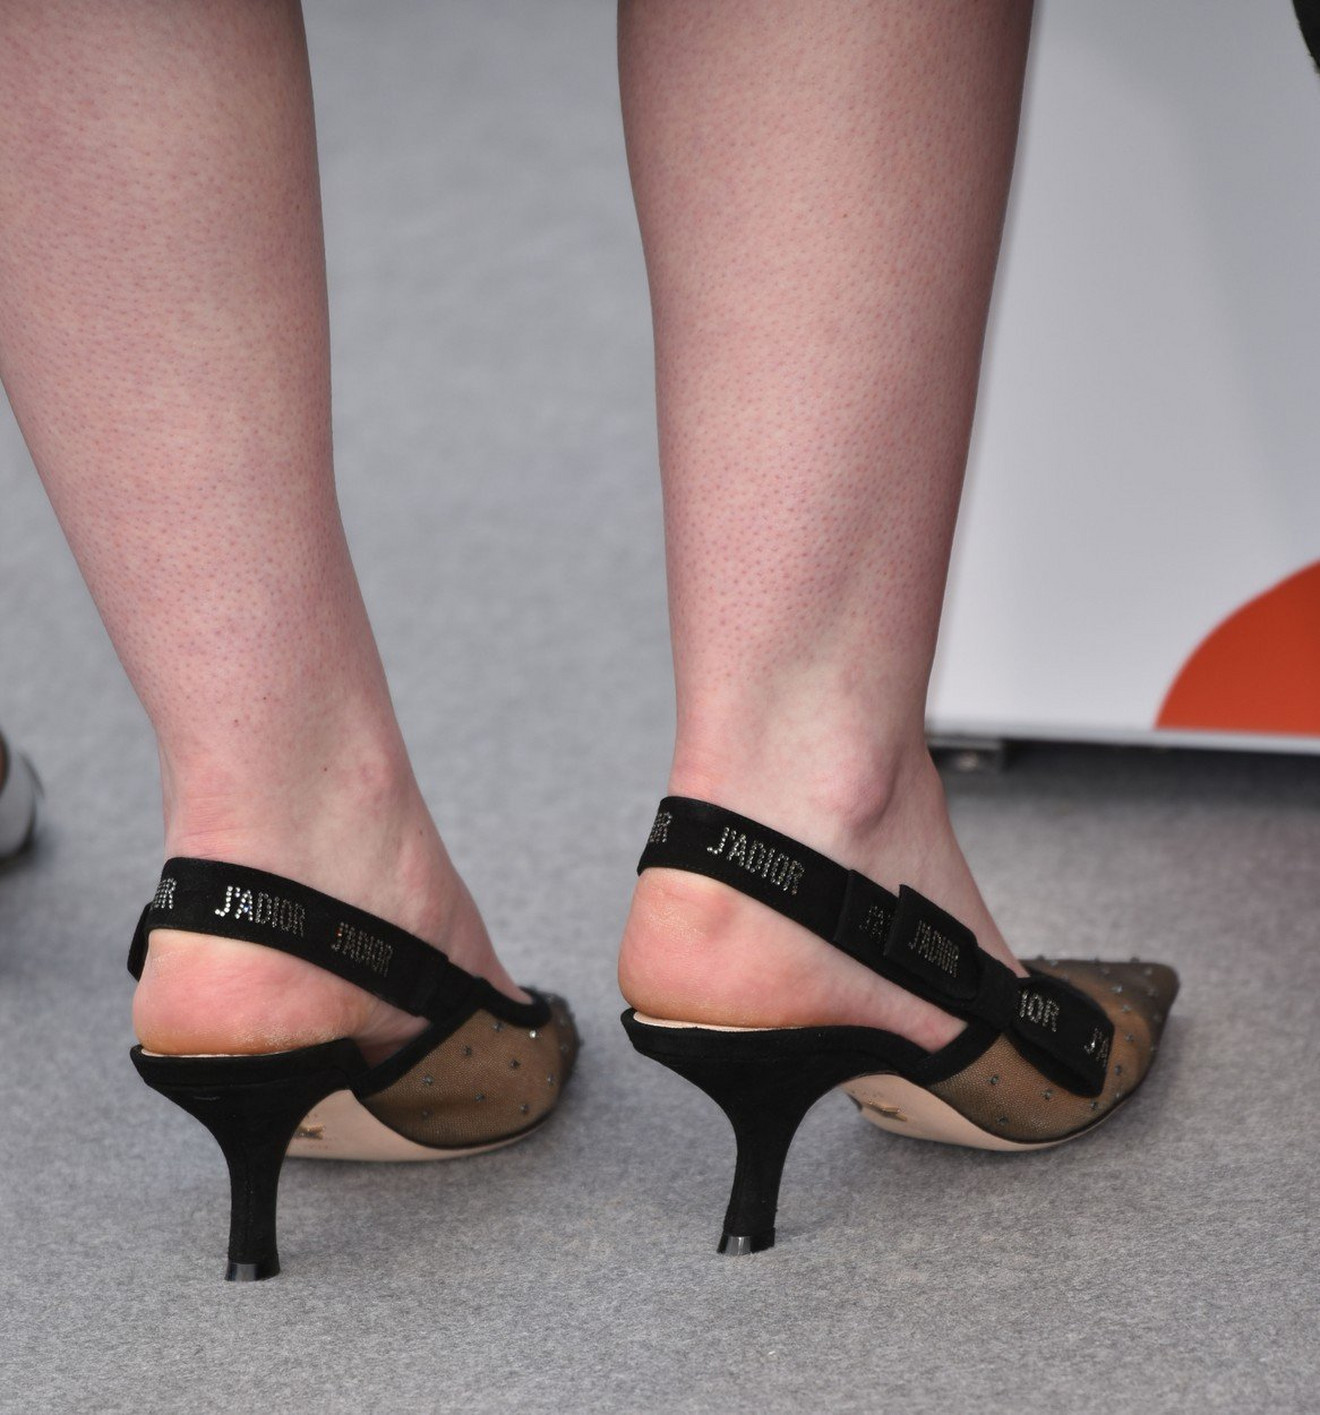 Sandale u prvom planu